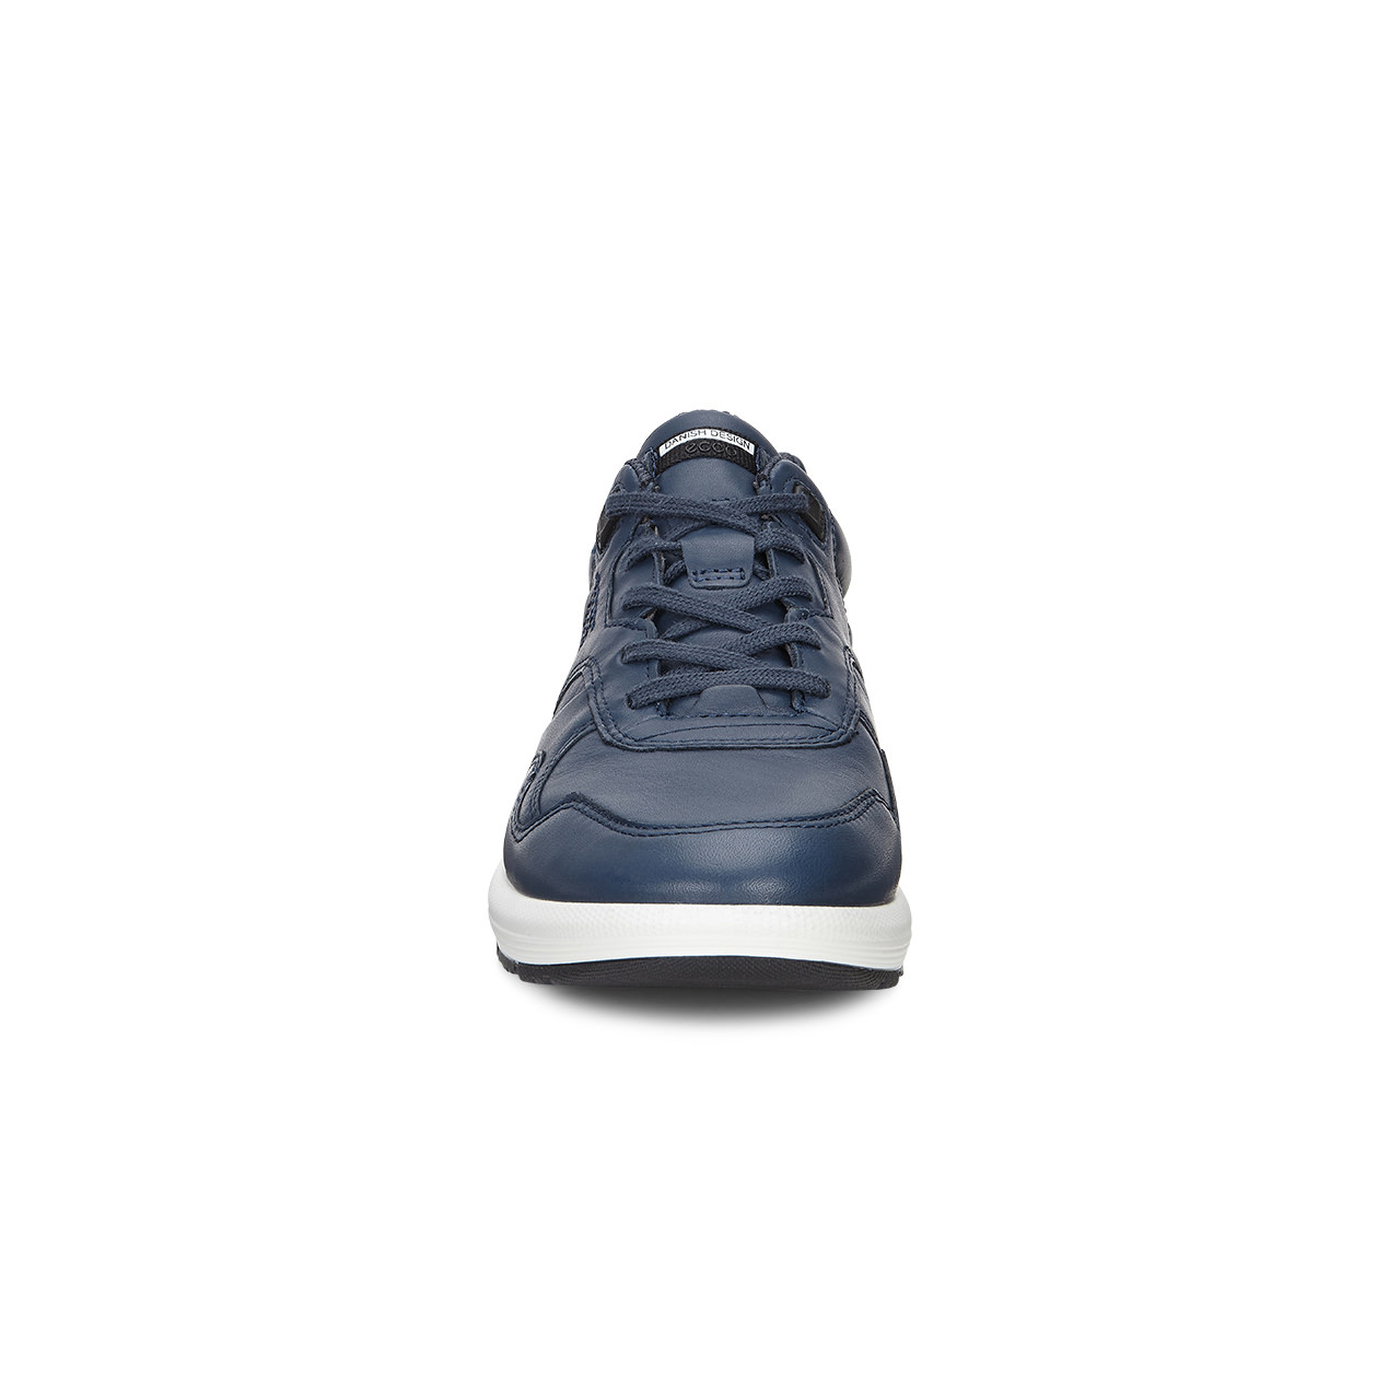 ECCO CS16 LADIES Sneaker